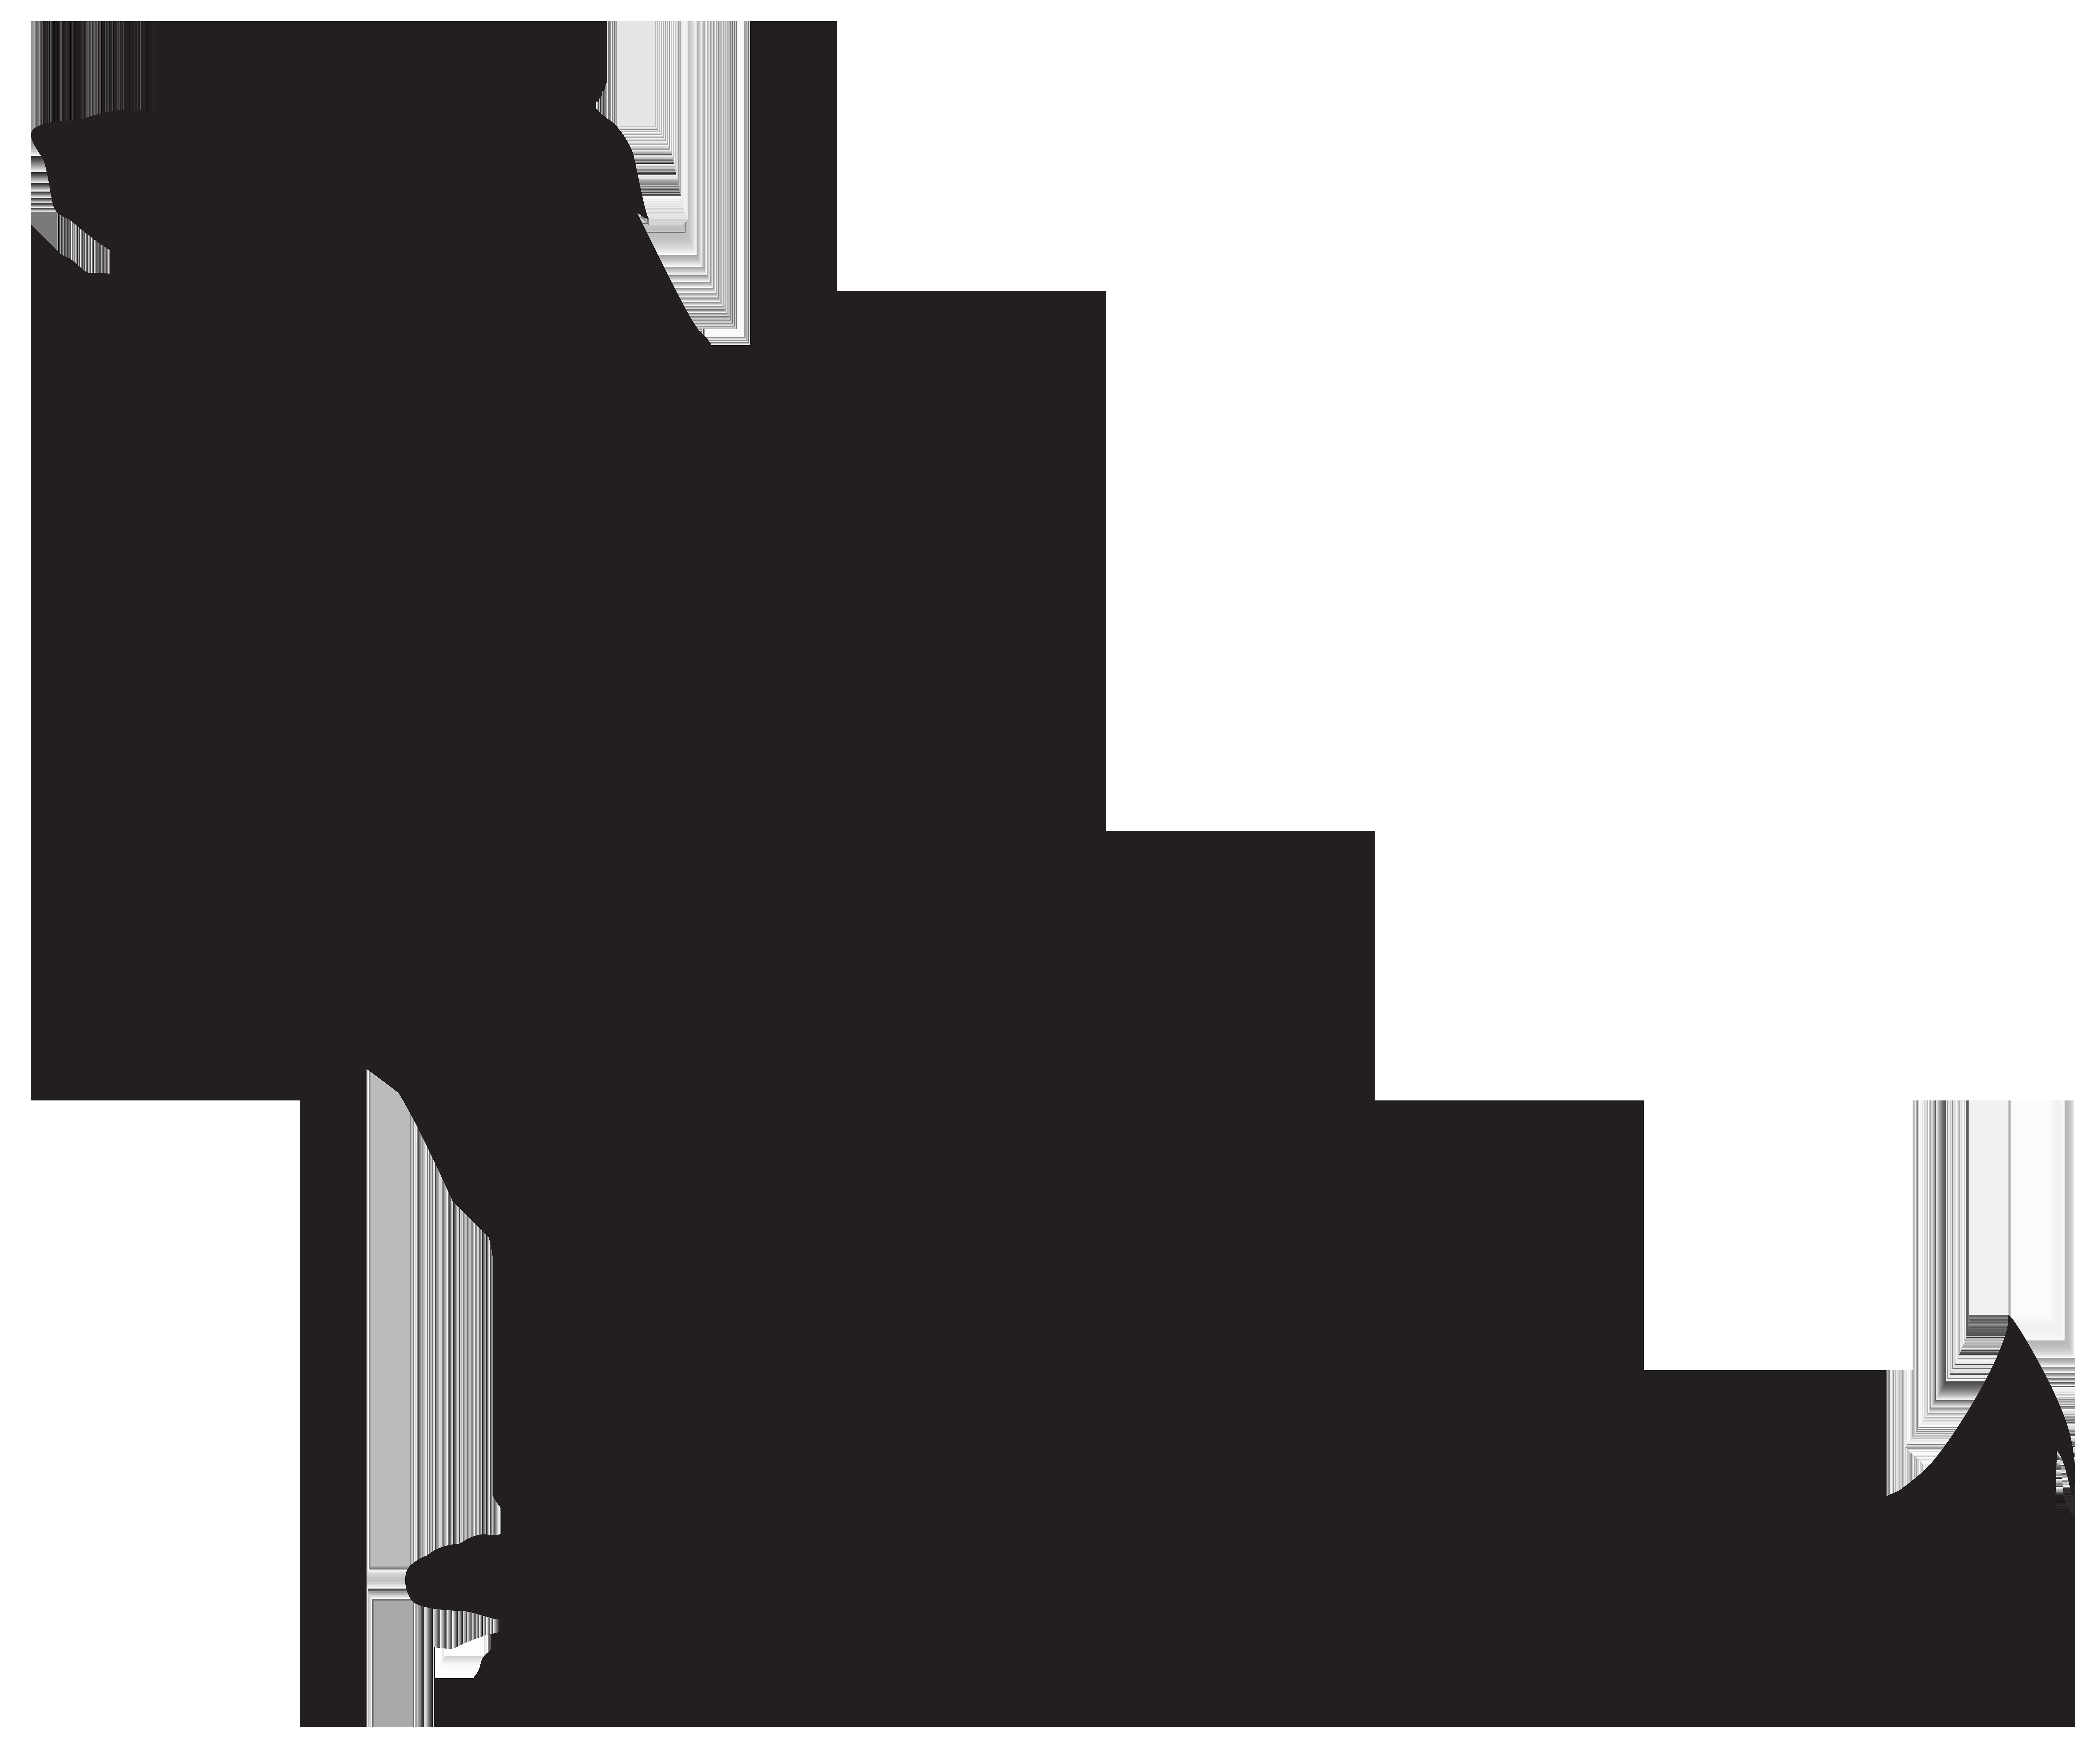 Dog Silhouette PNG Transparent Clip Art Image